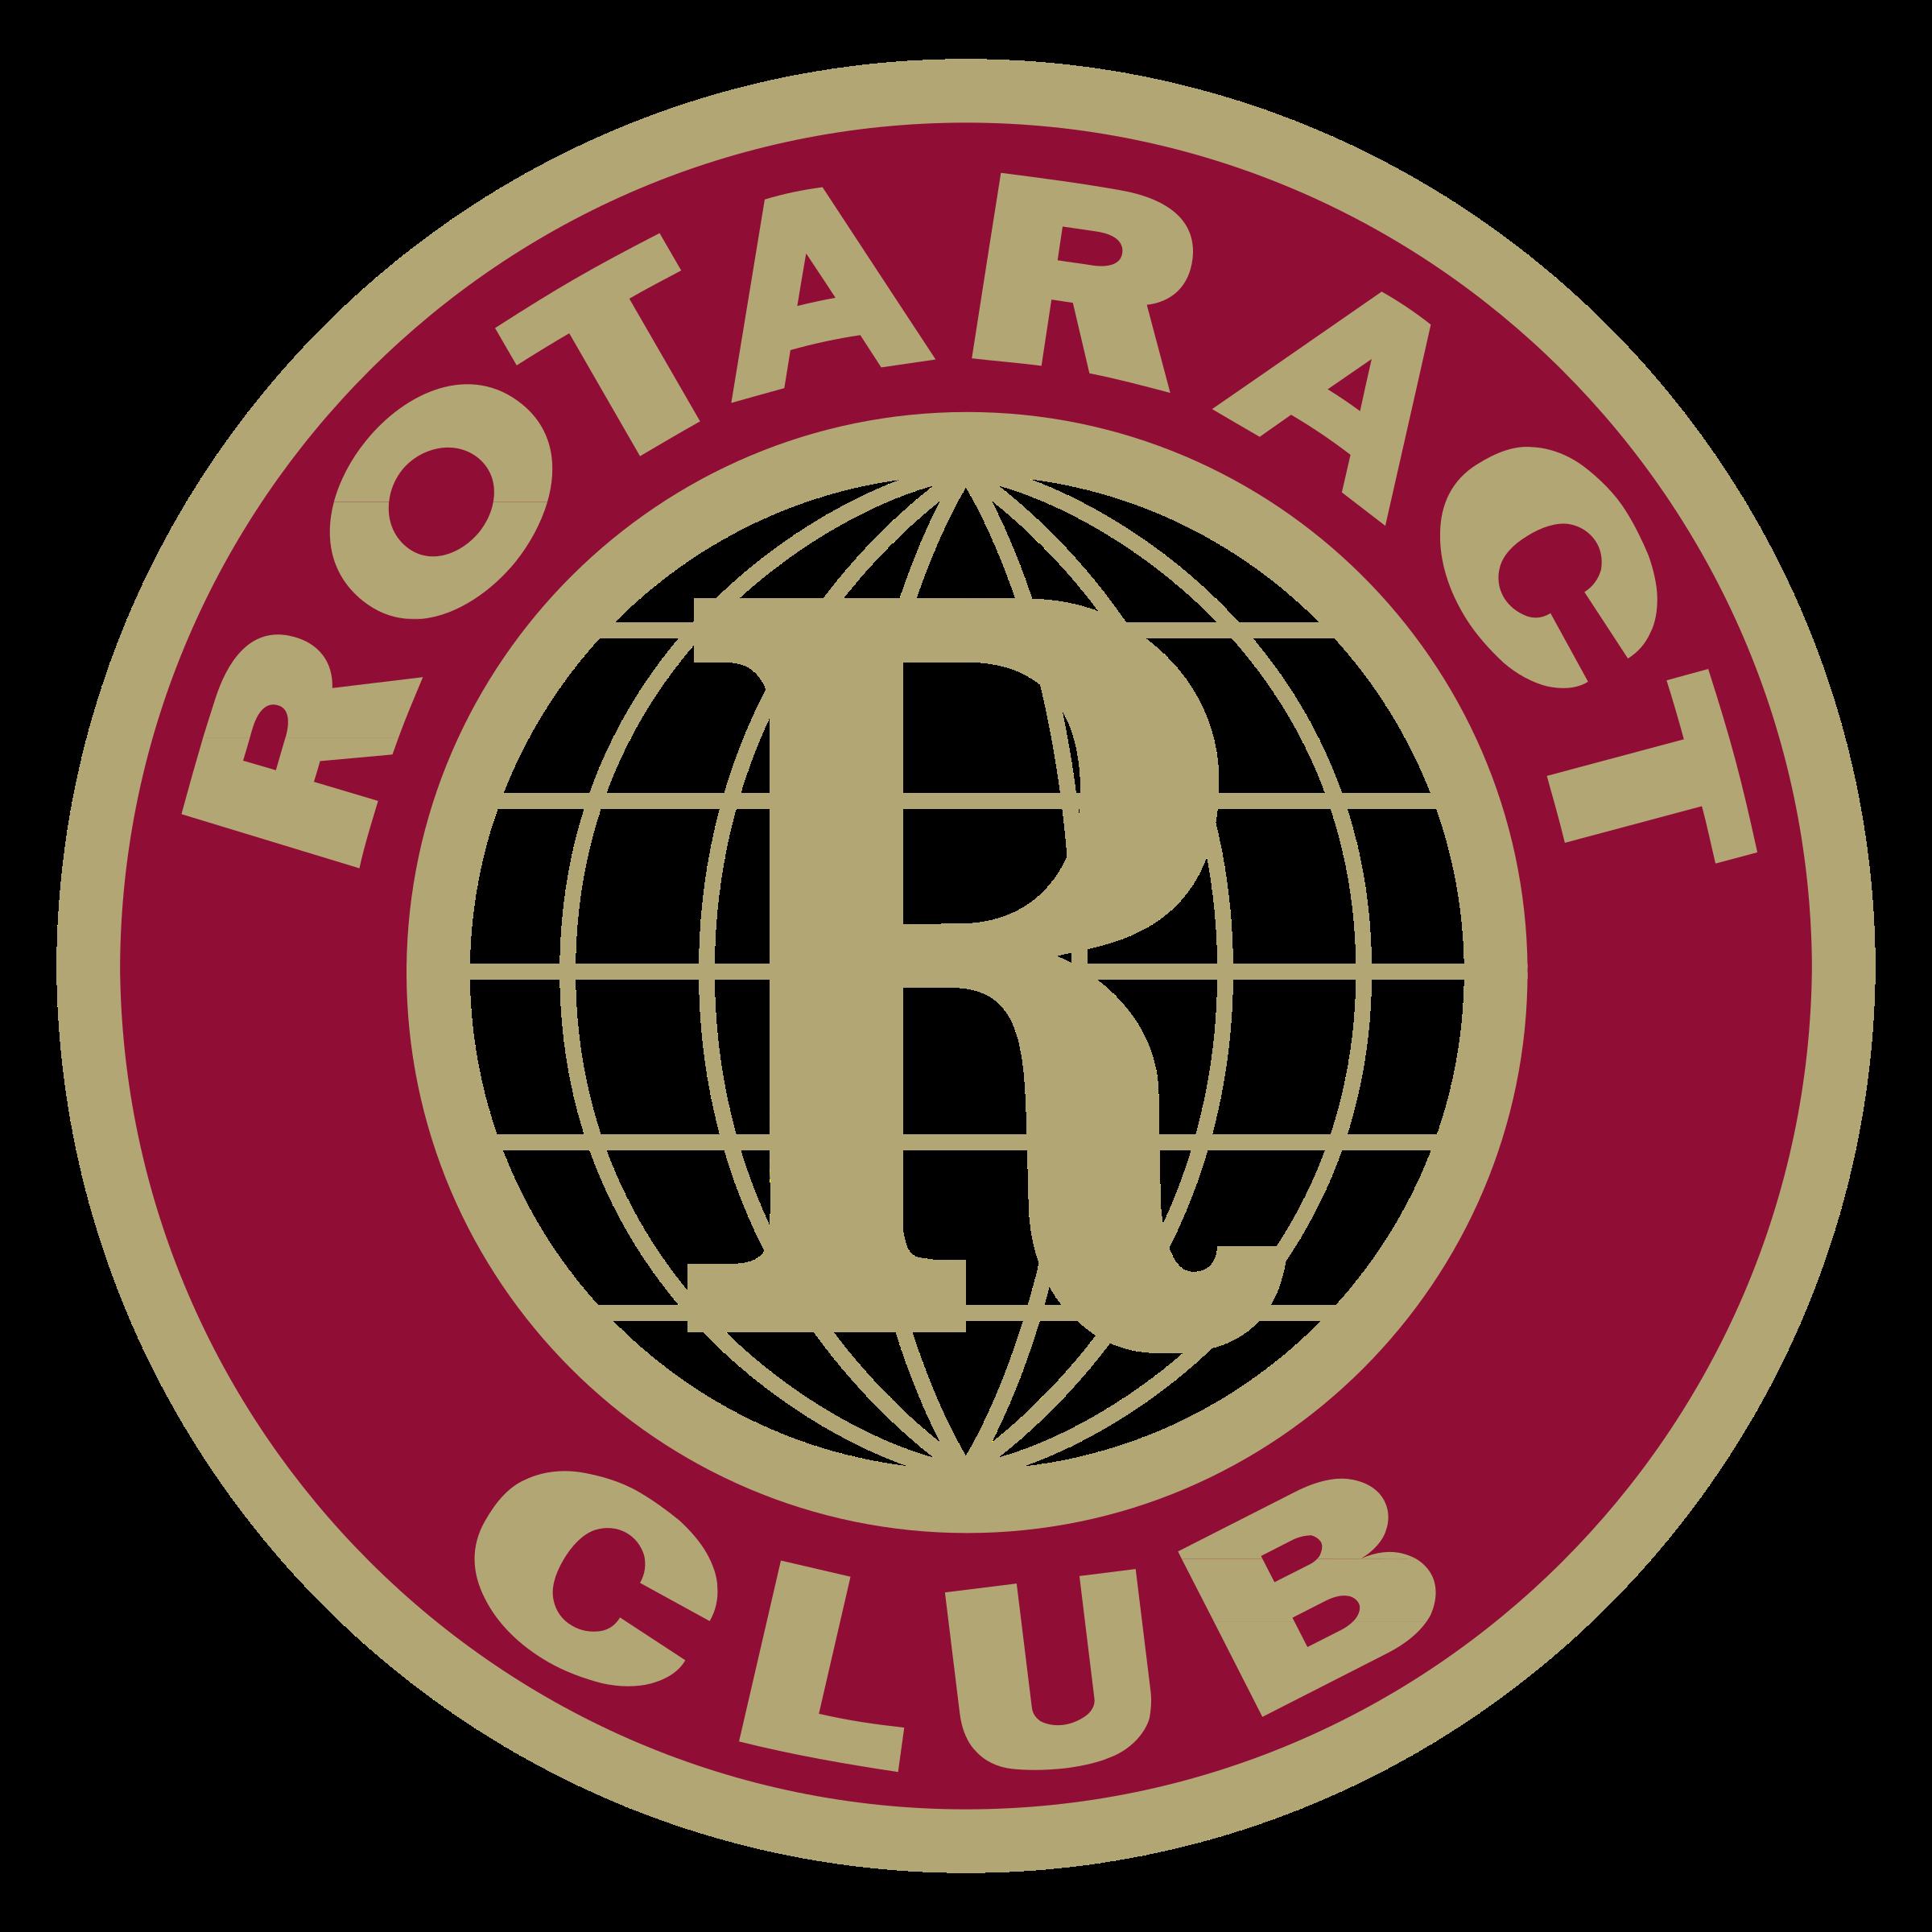 Rotaract Club Logo PNG Transparent & SVG Vector.